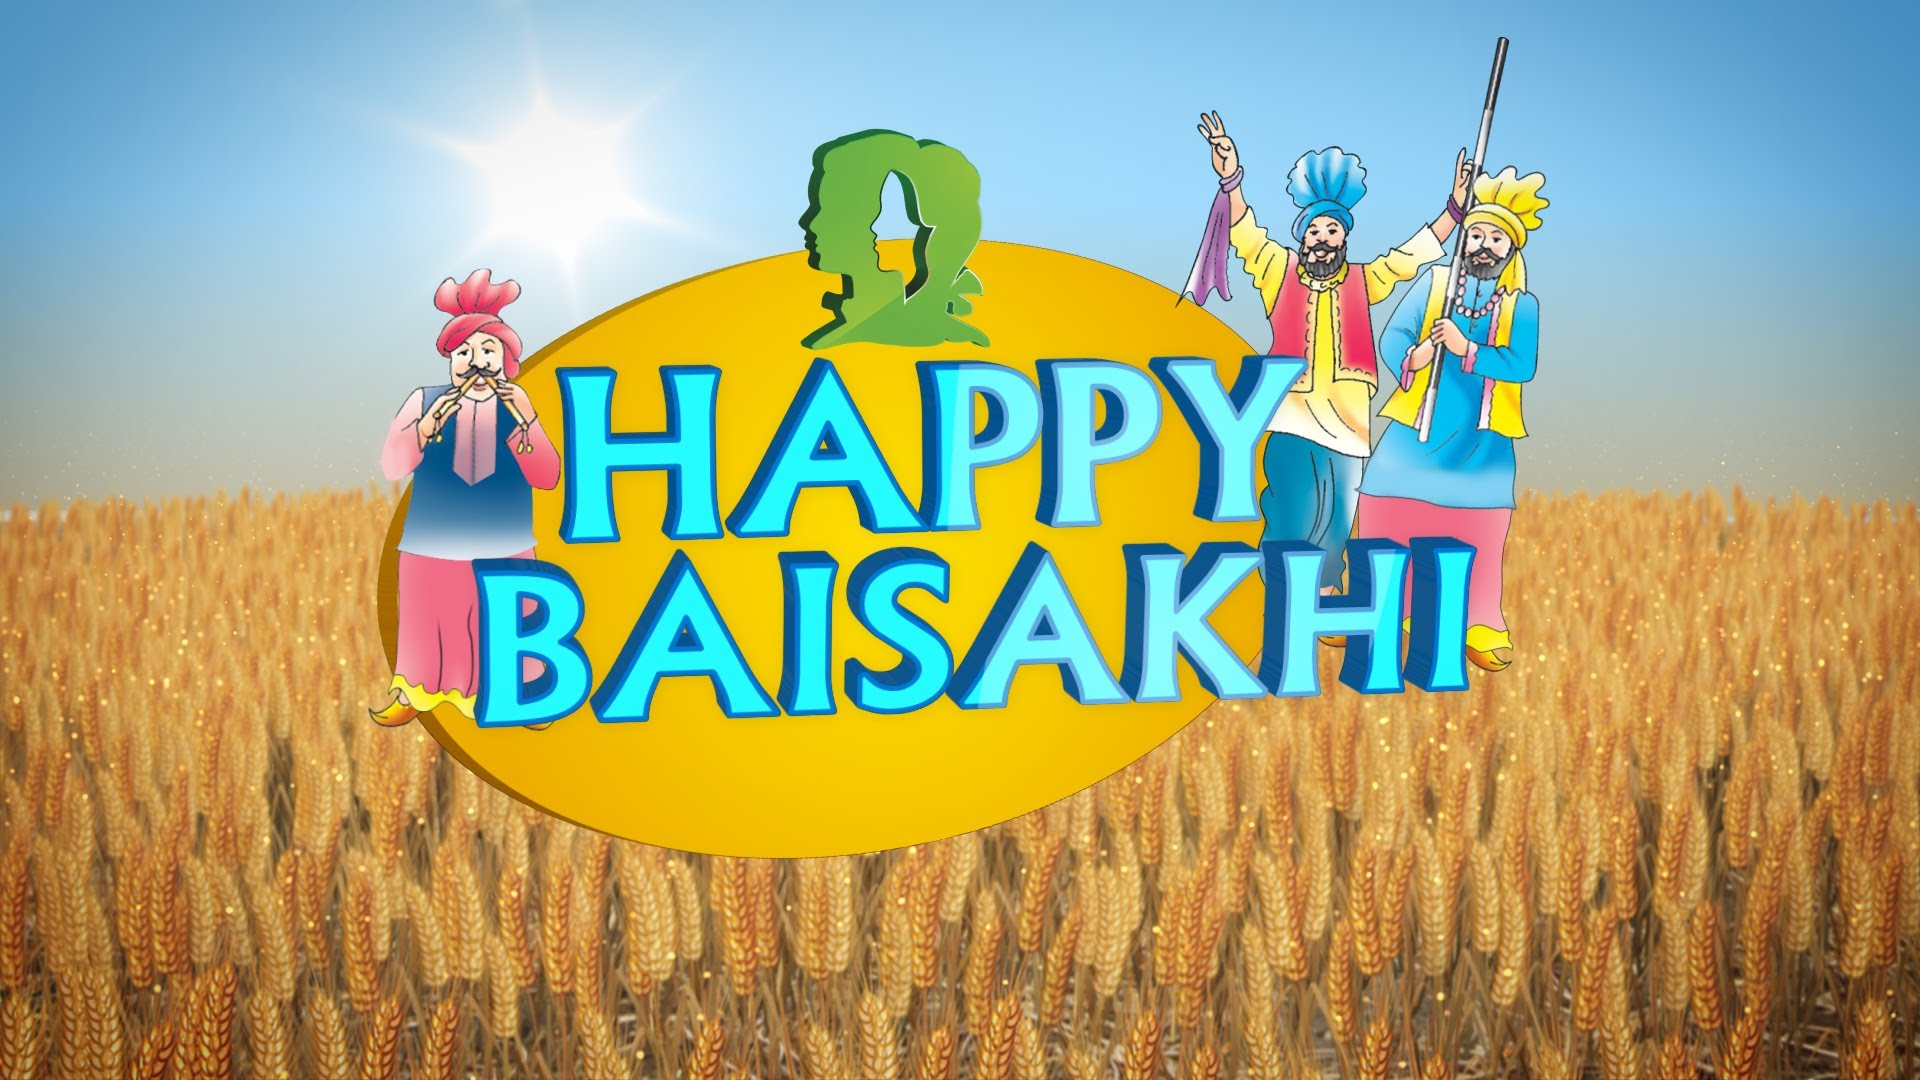 Happy Baisakhi Wallpaper